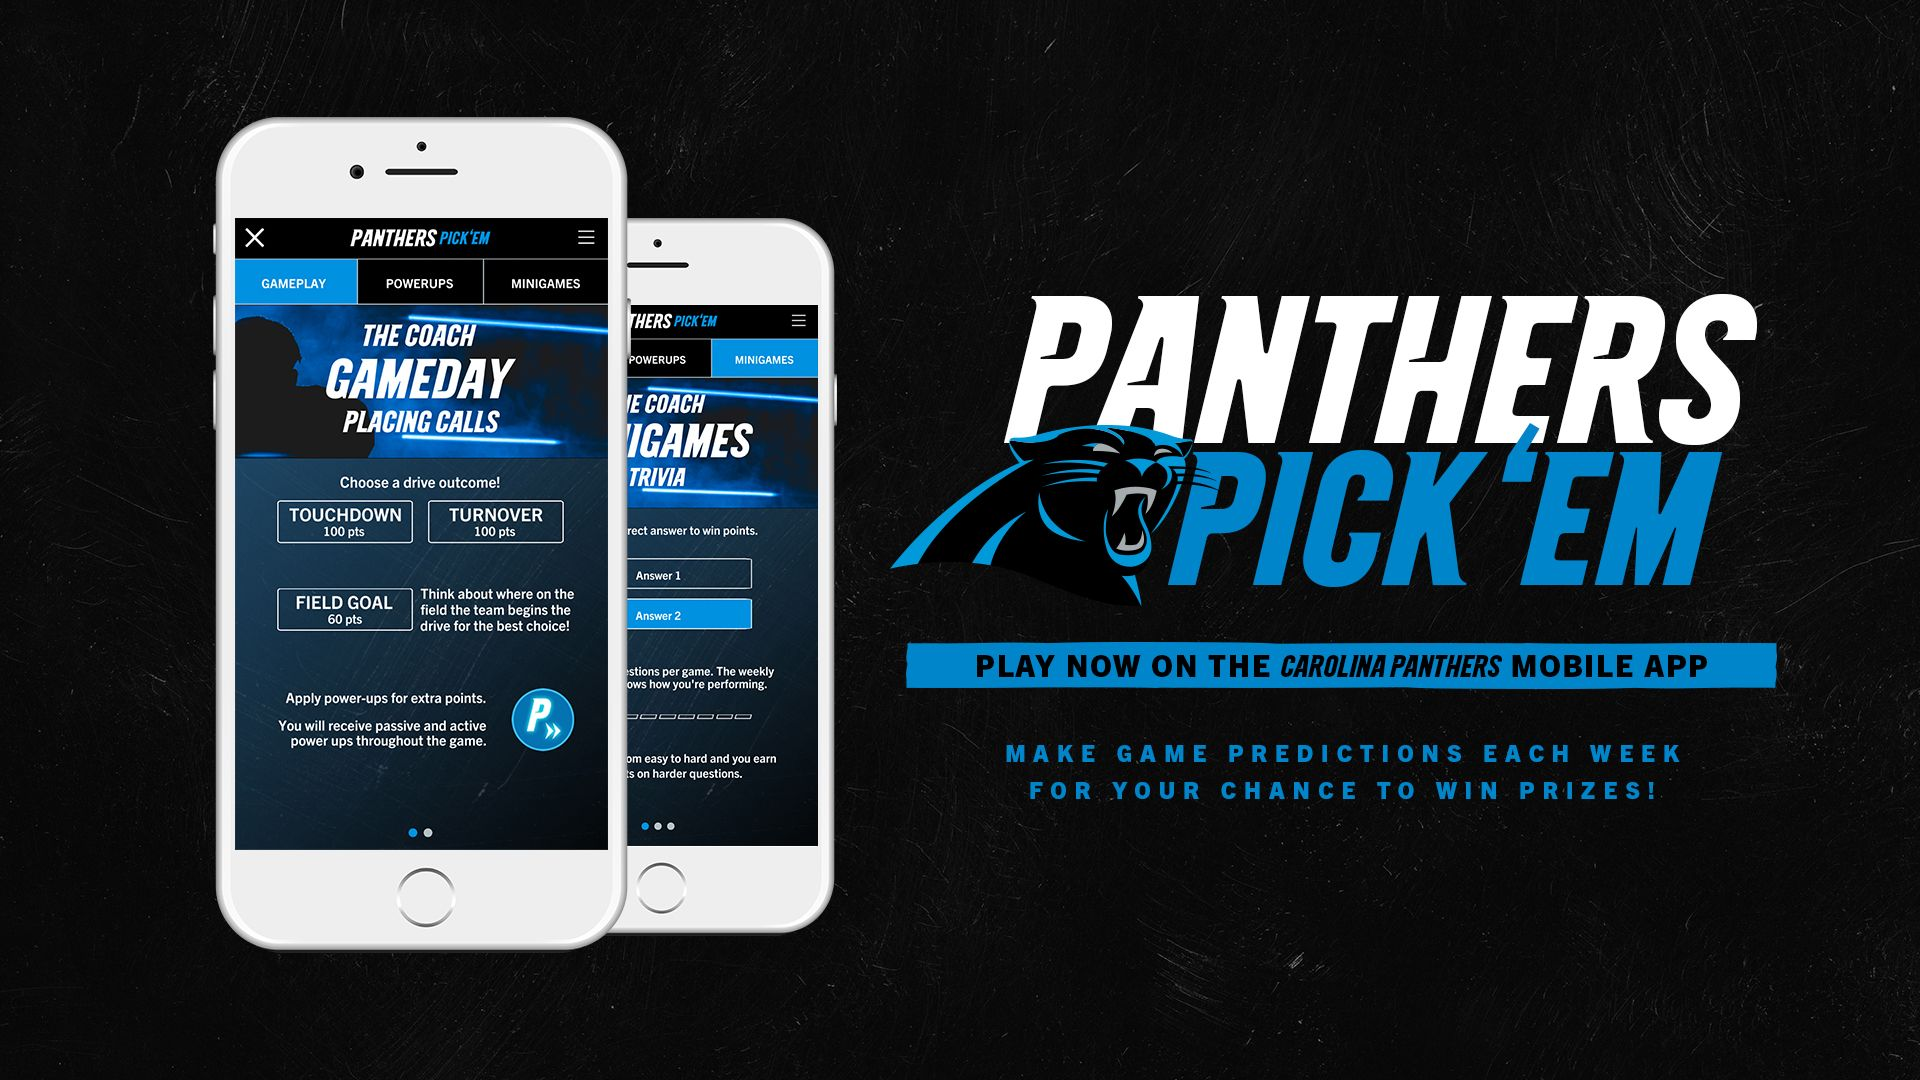 Panthers Pick'Em